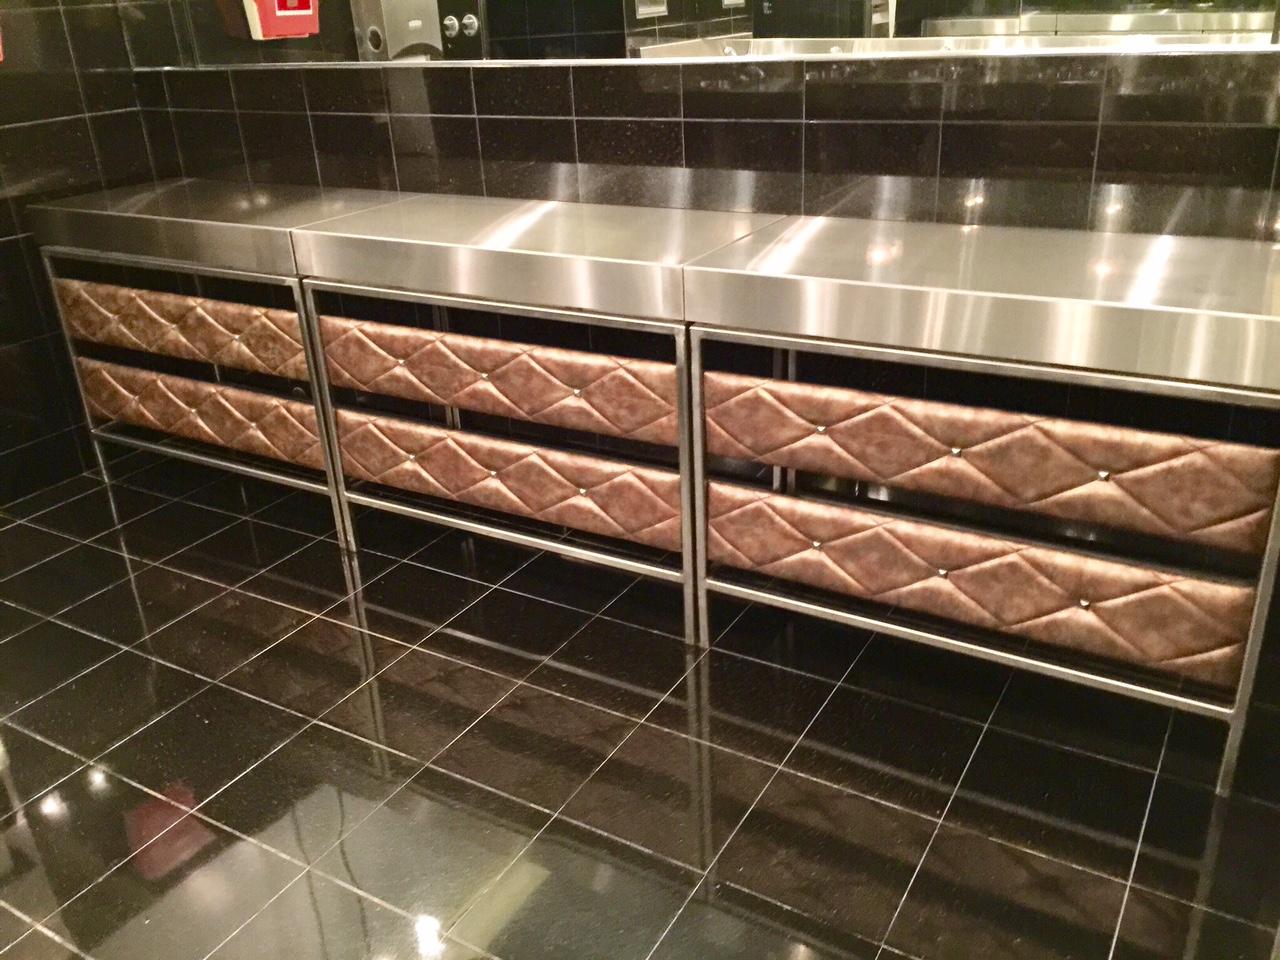 Pink Taco Bathroom @ Hard Rock Hotel, Las Vegas